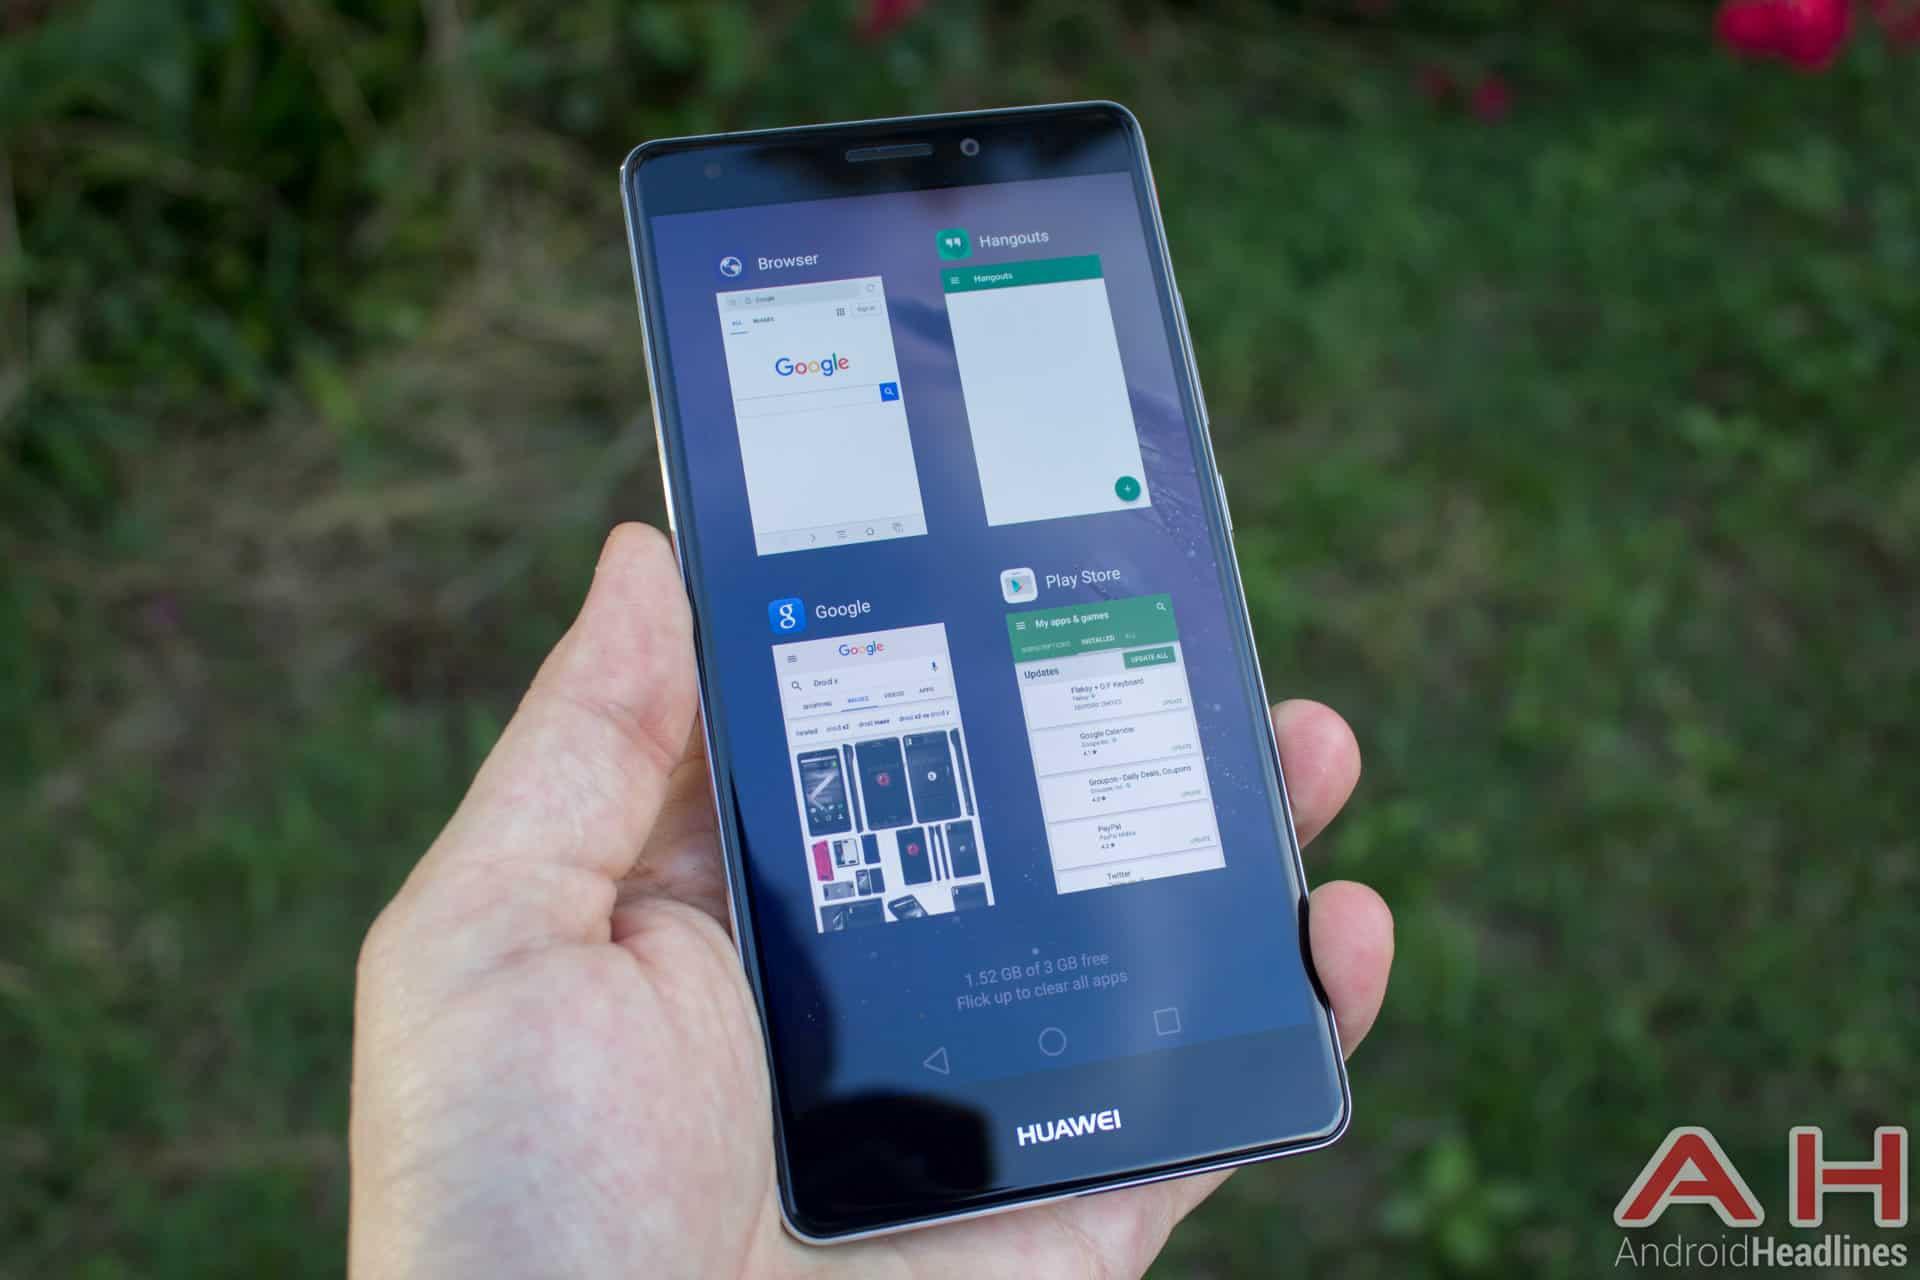 Huawei-Mate-S-AH-NS-multi-task